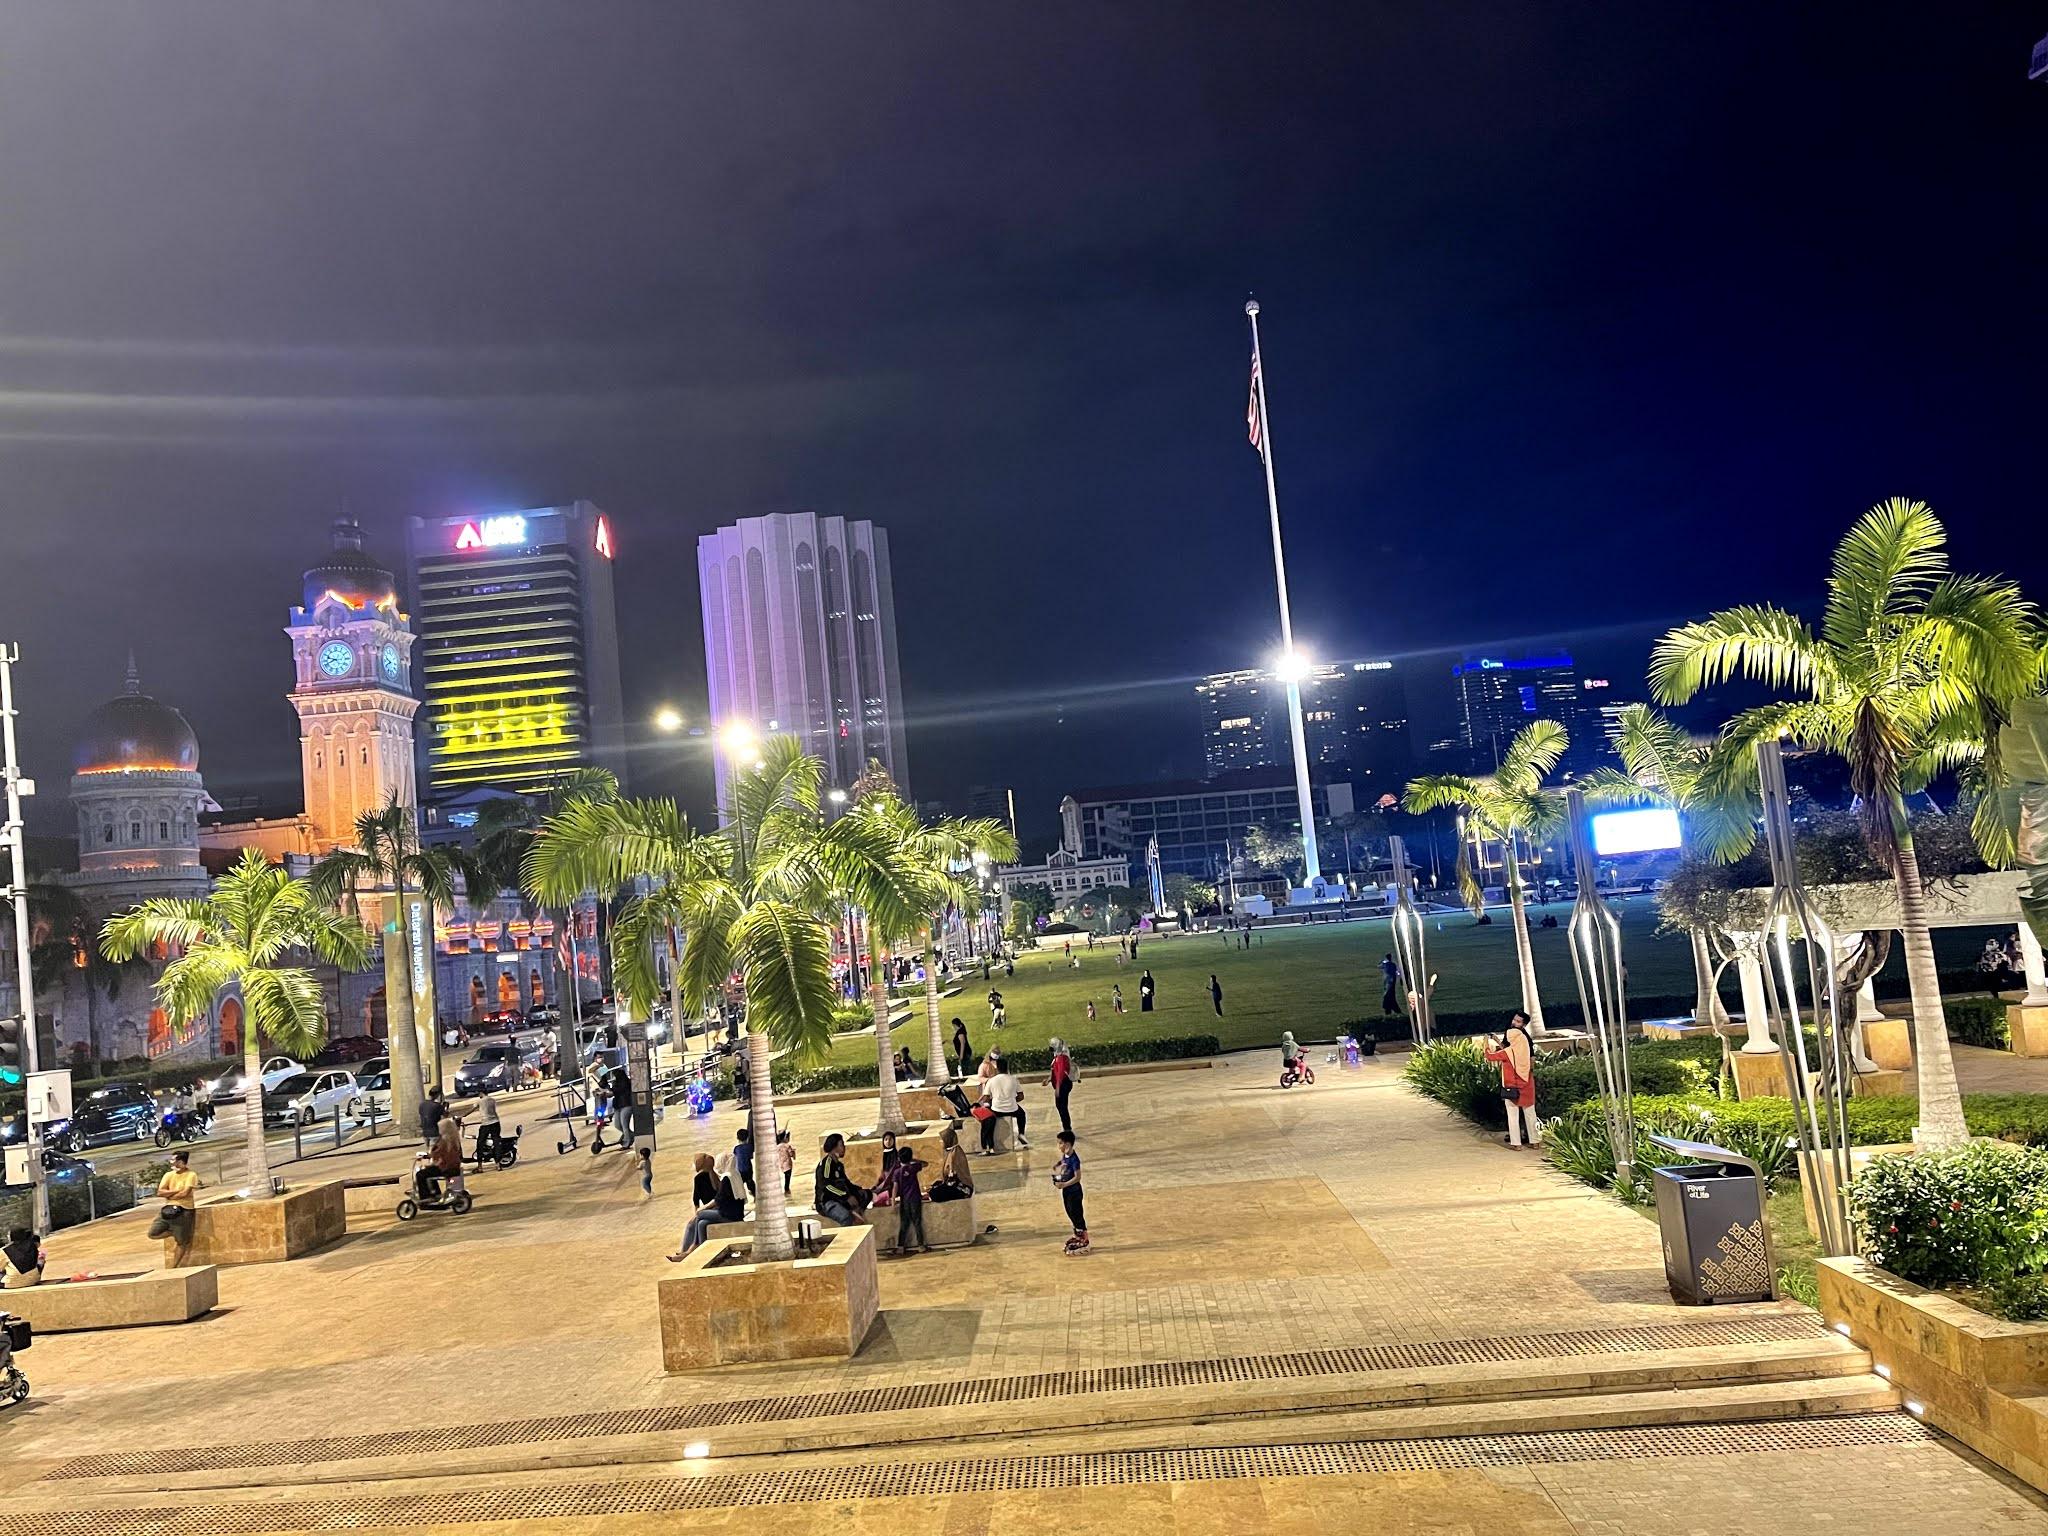 KL HOP ON HOP OFF BAWA KL CITY OF LIGHTS NIKMATI MALAM DI KUALA LUMPUR